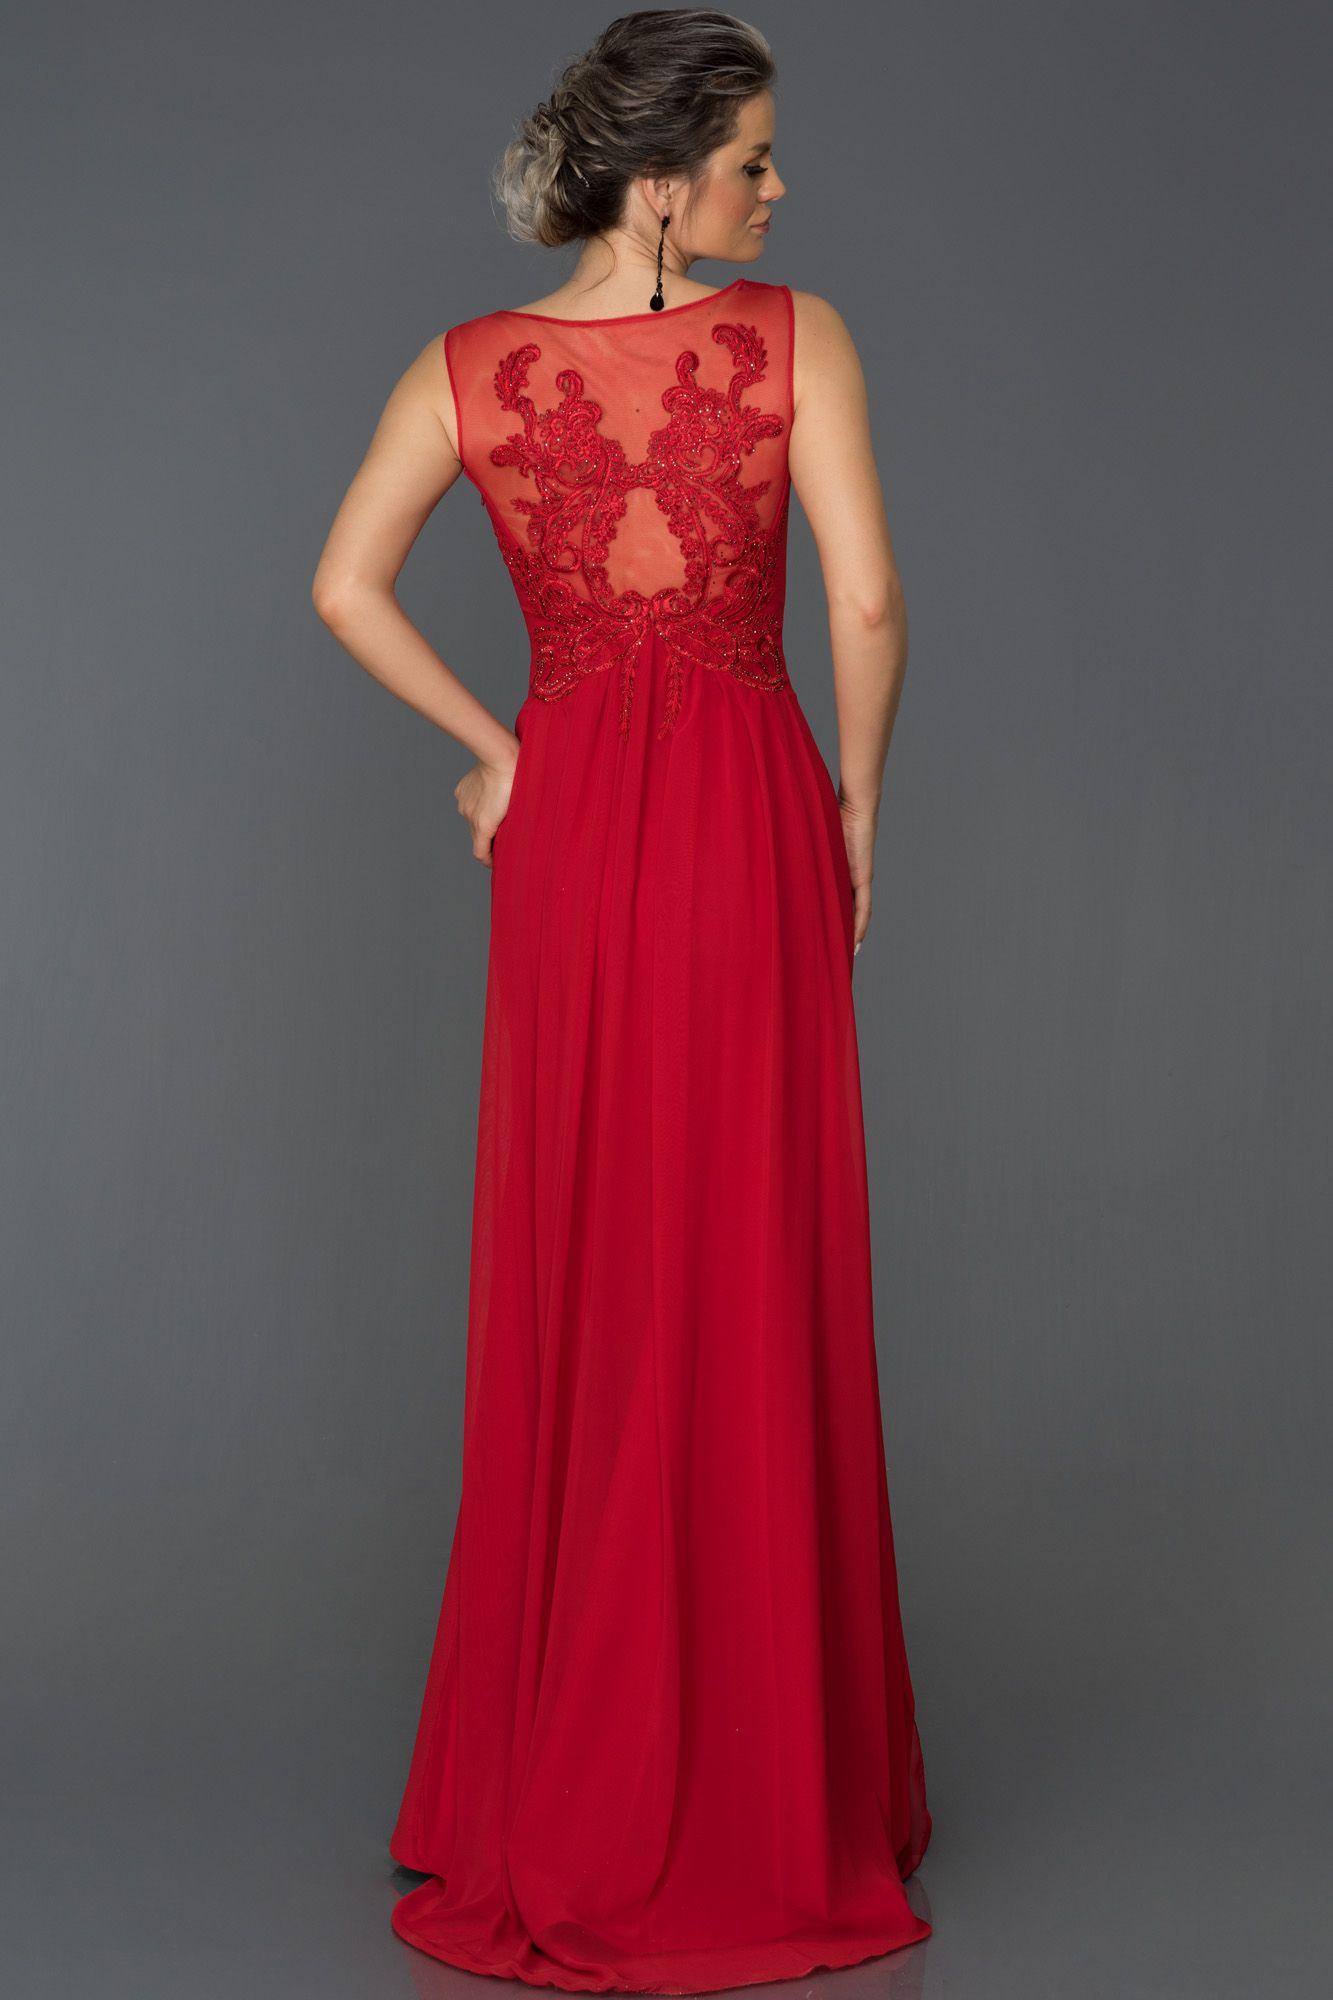 a0bfee1297ffa V Yaka Uzun Abiye Elbise AB7052   abiyeler elbiseler   Elbise ...